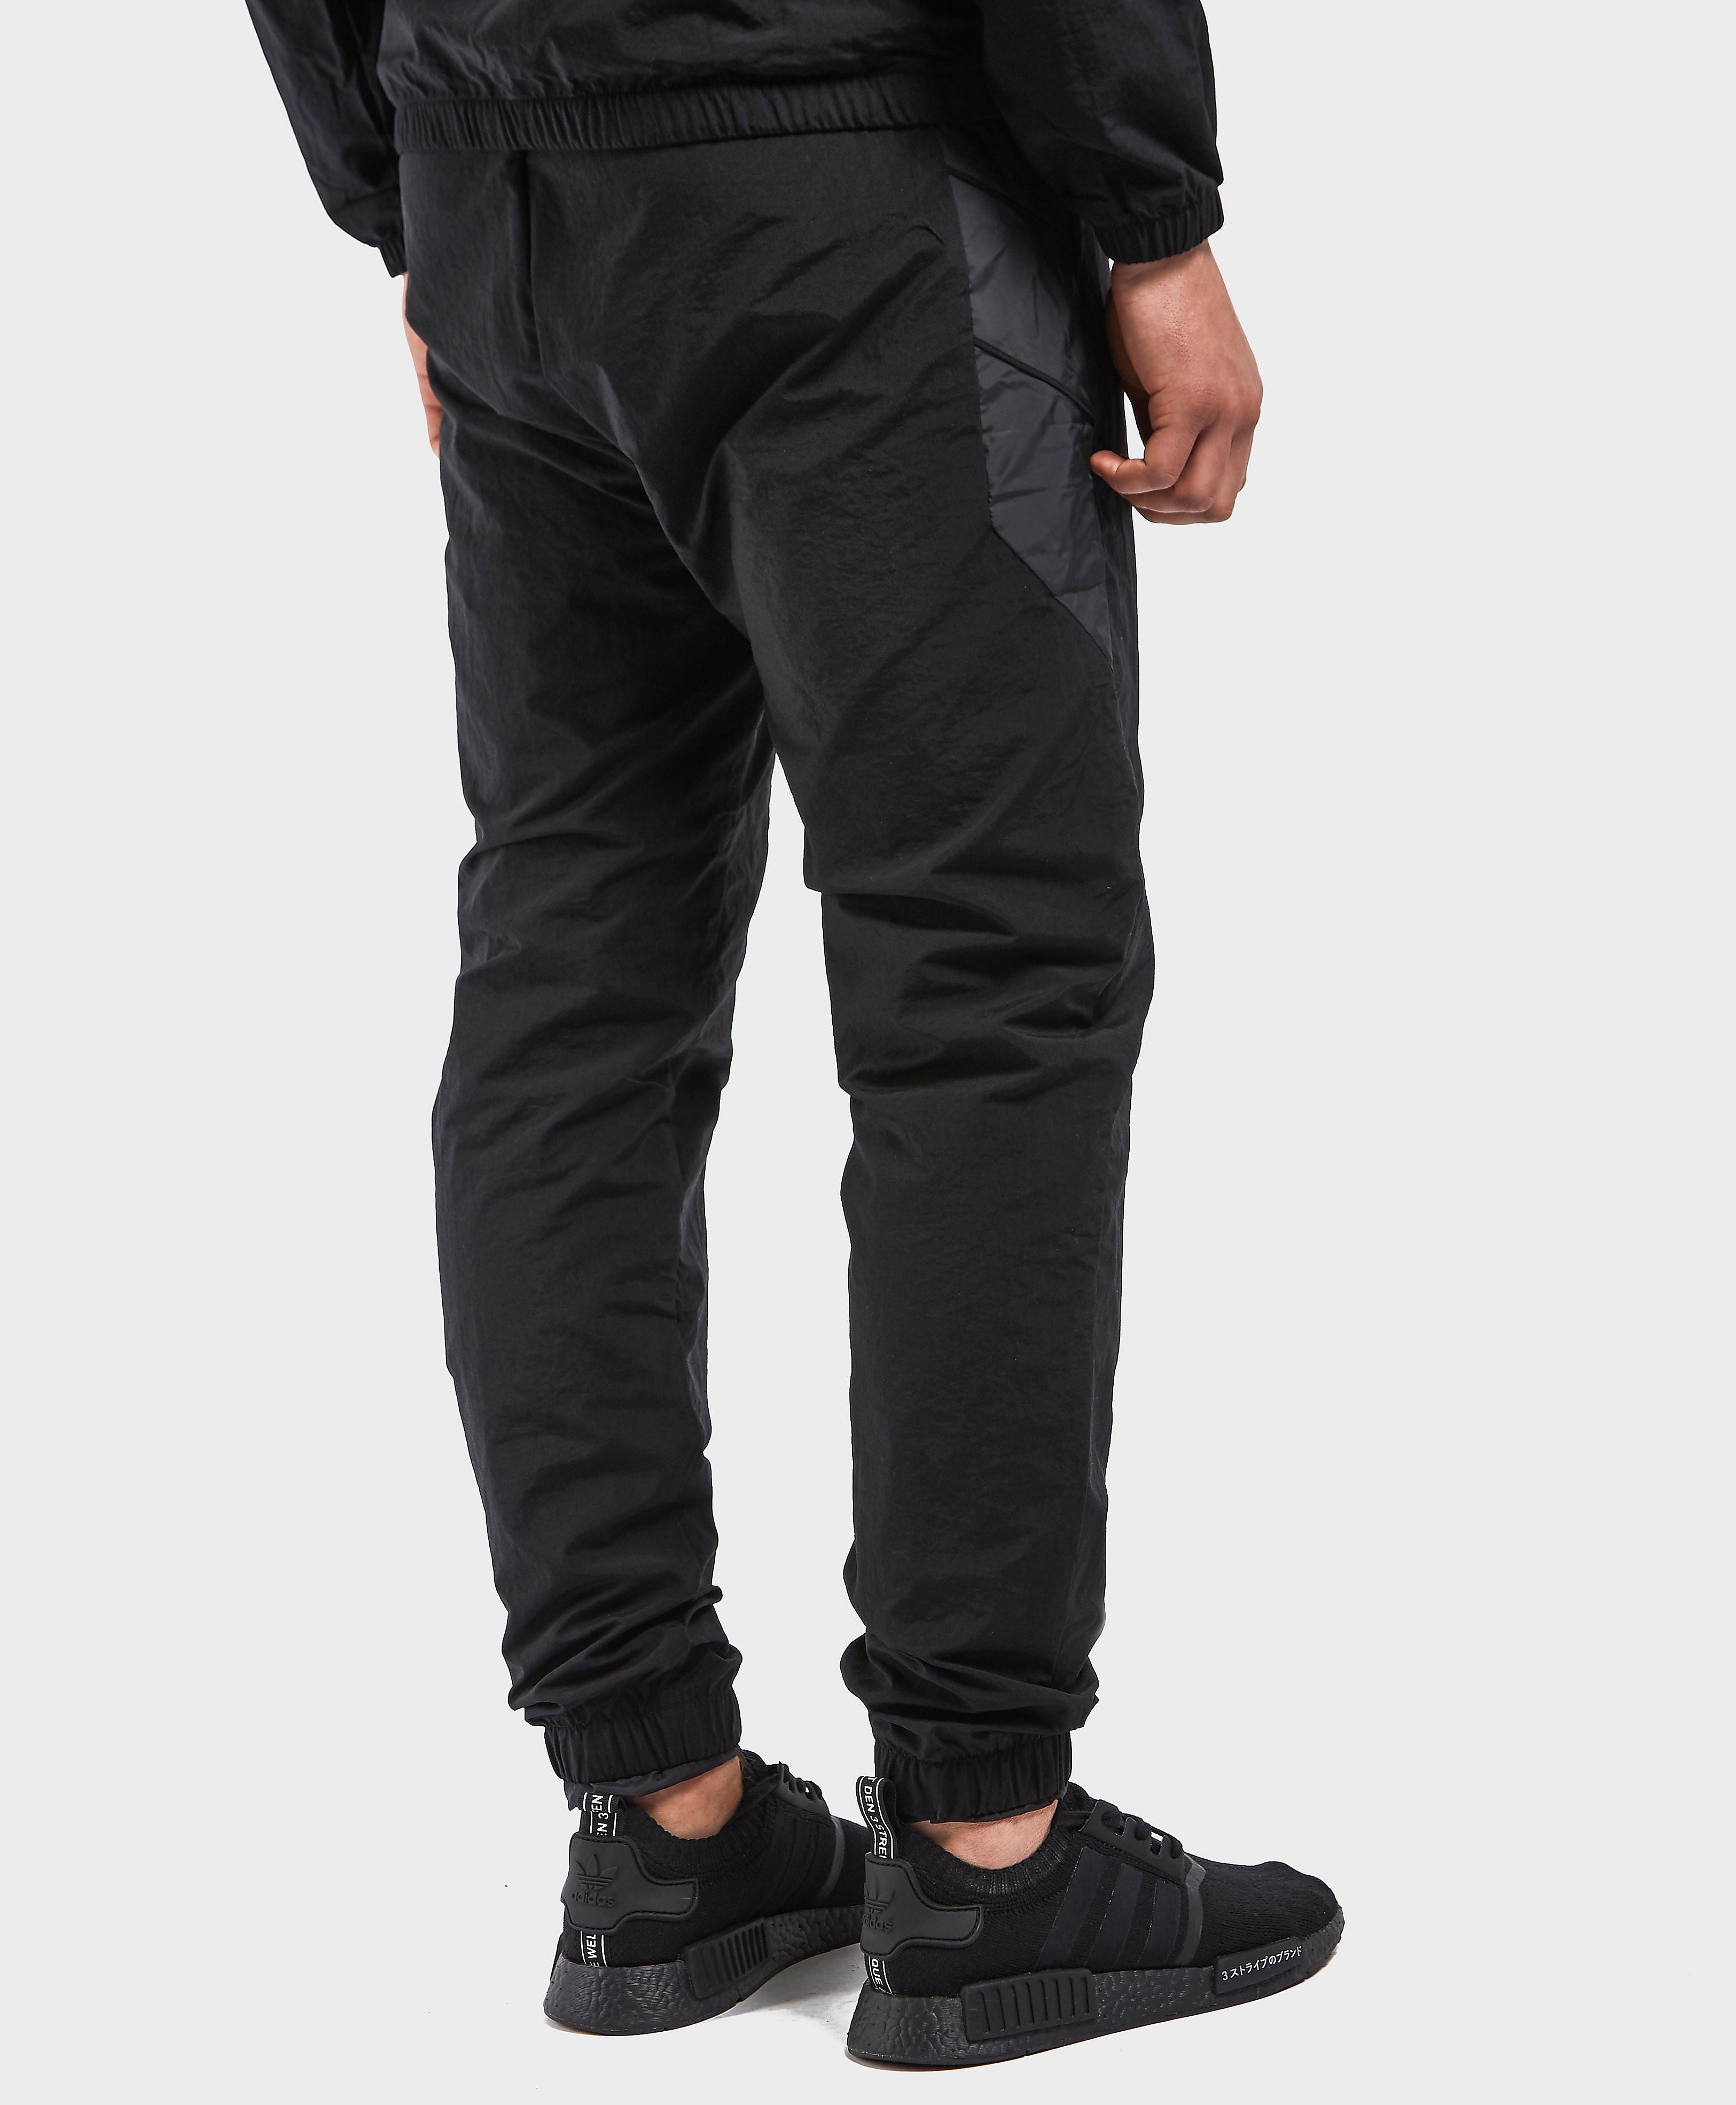 adidas Originals 90s Track Pants